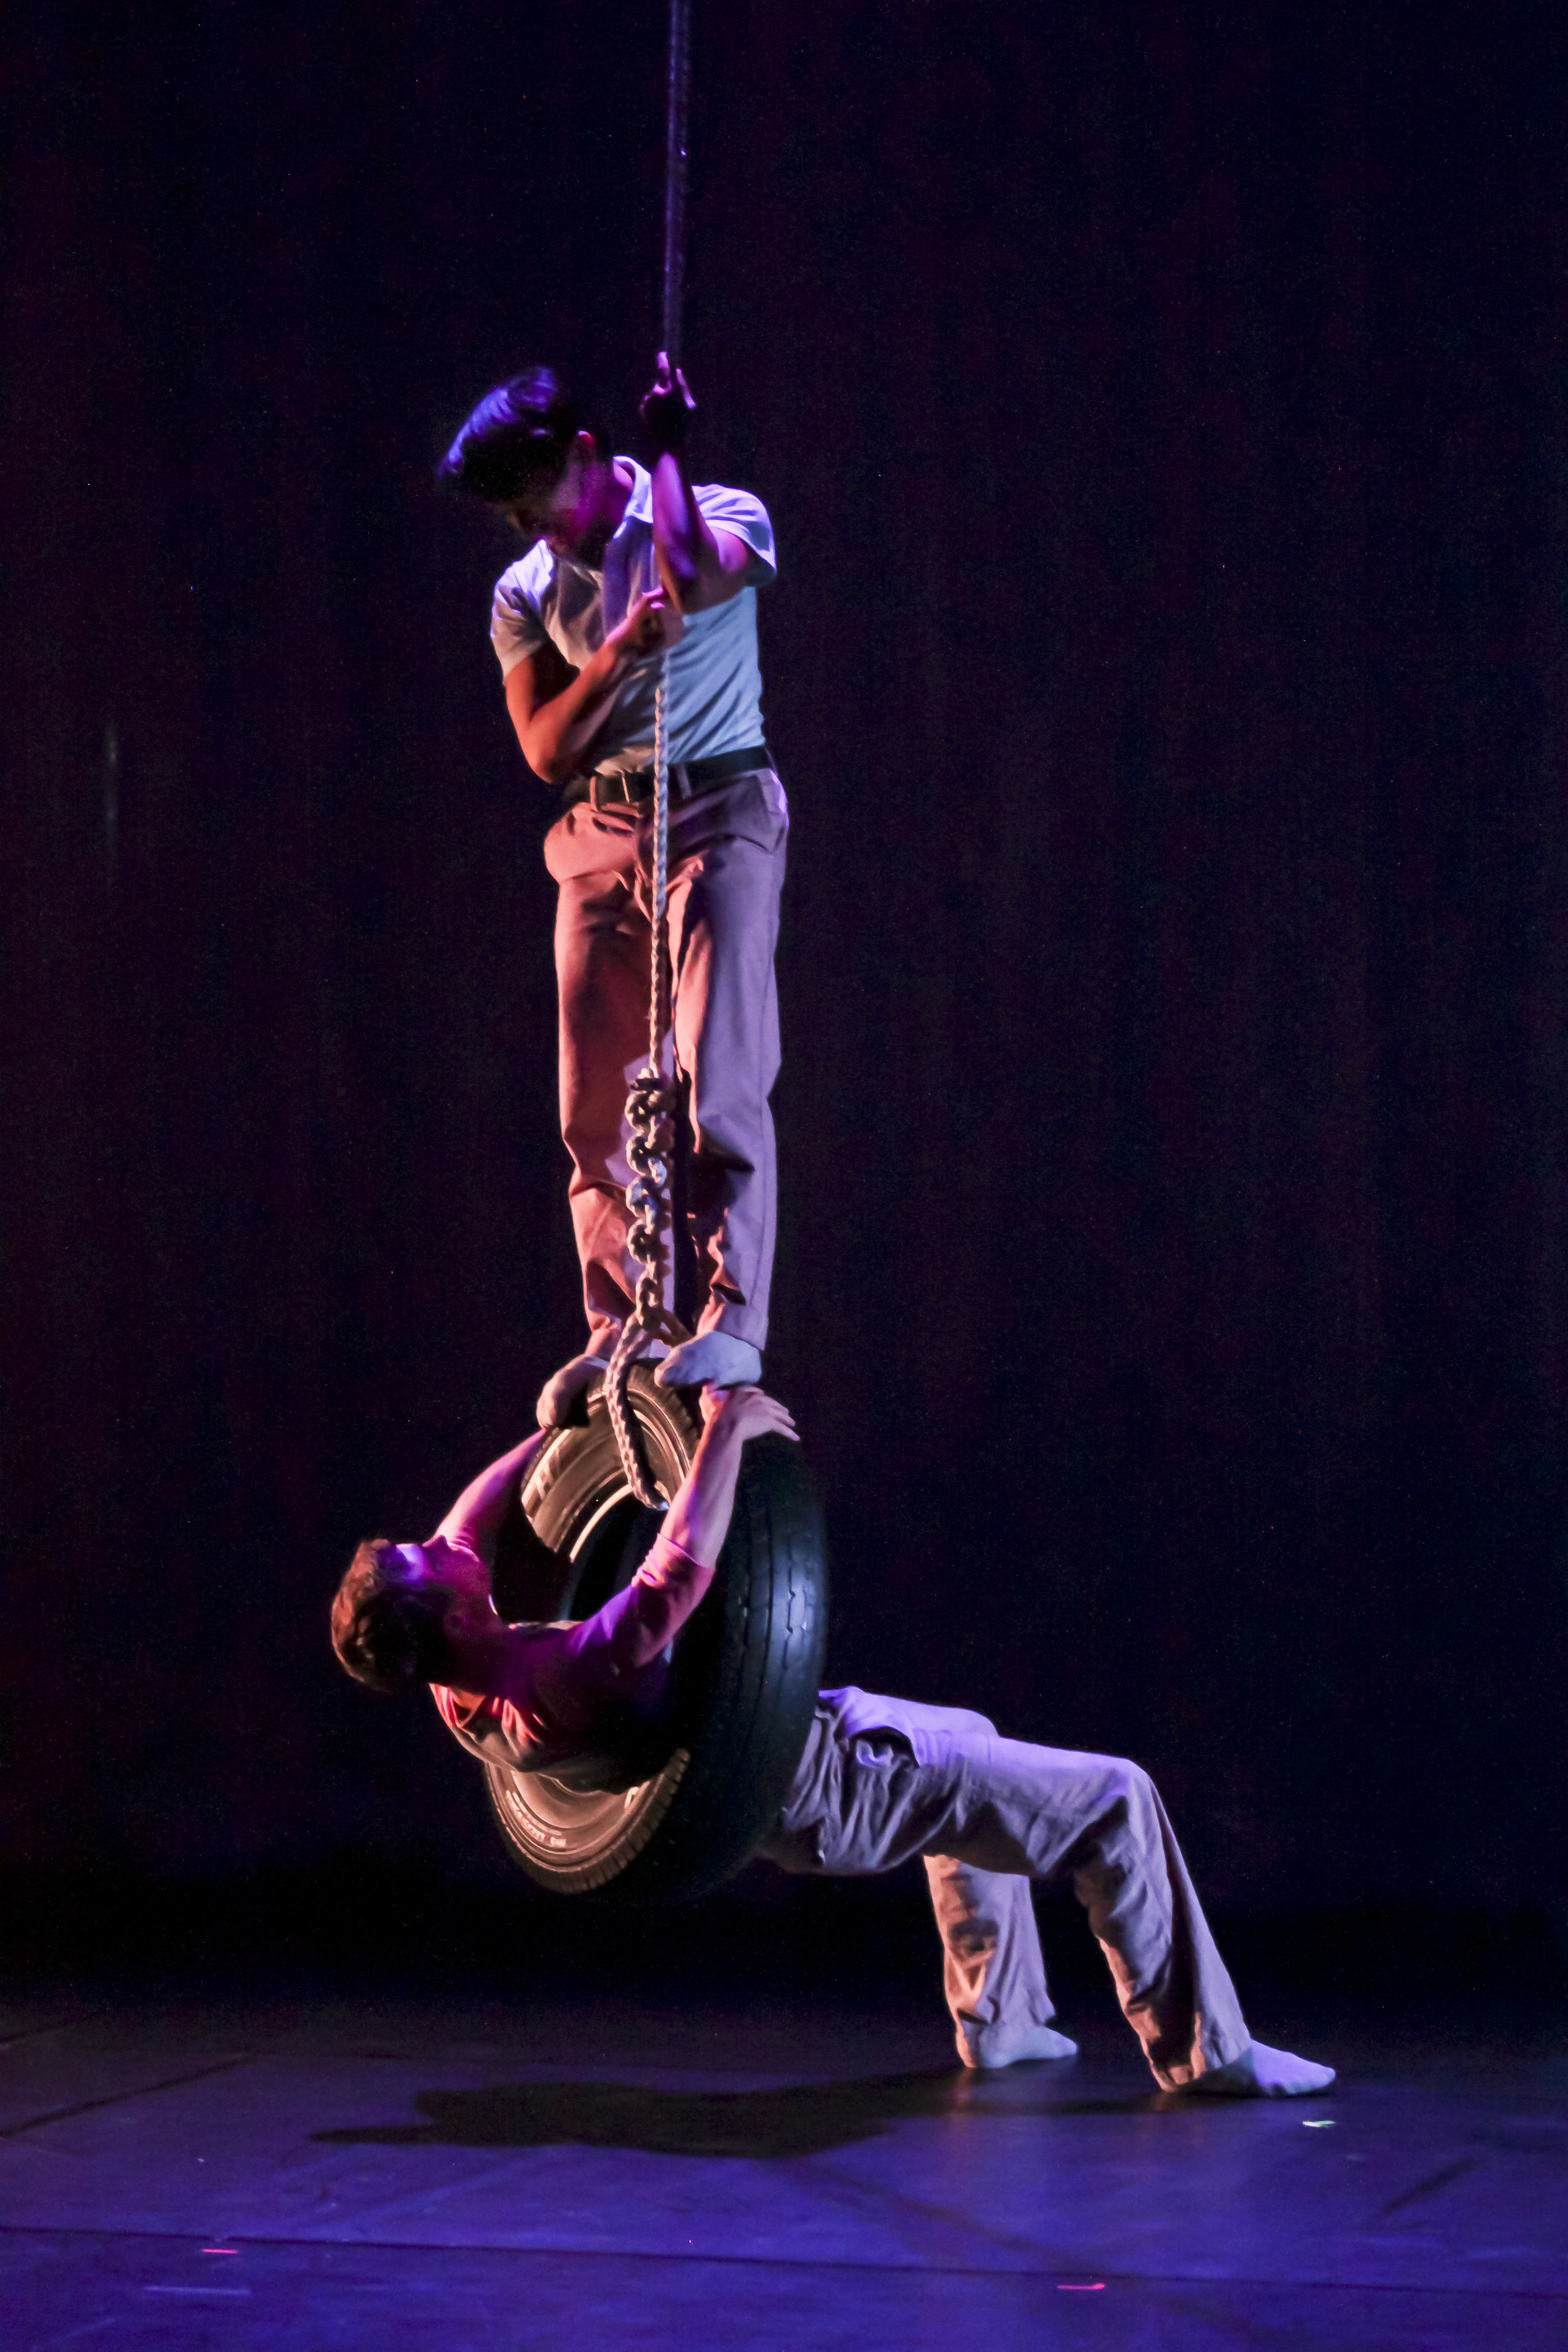 andy-broomell-scenic-design-dance-personal-mythology-4.jpg